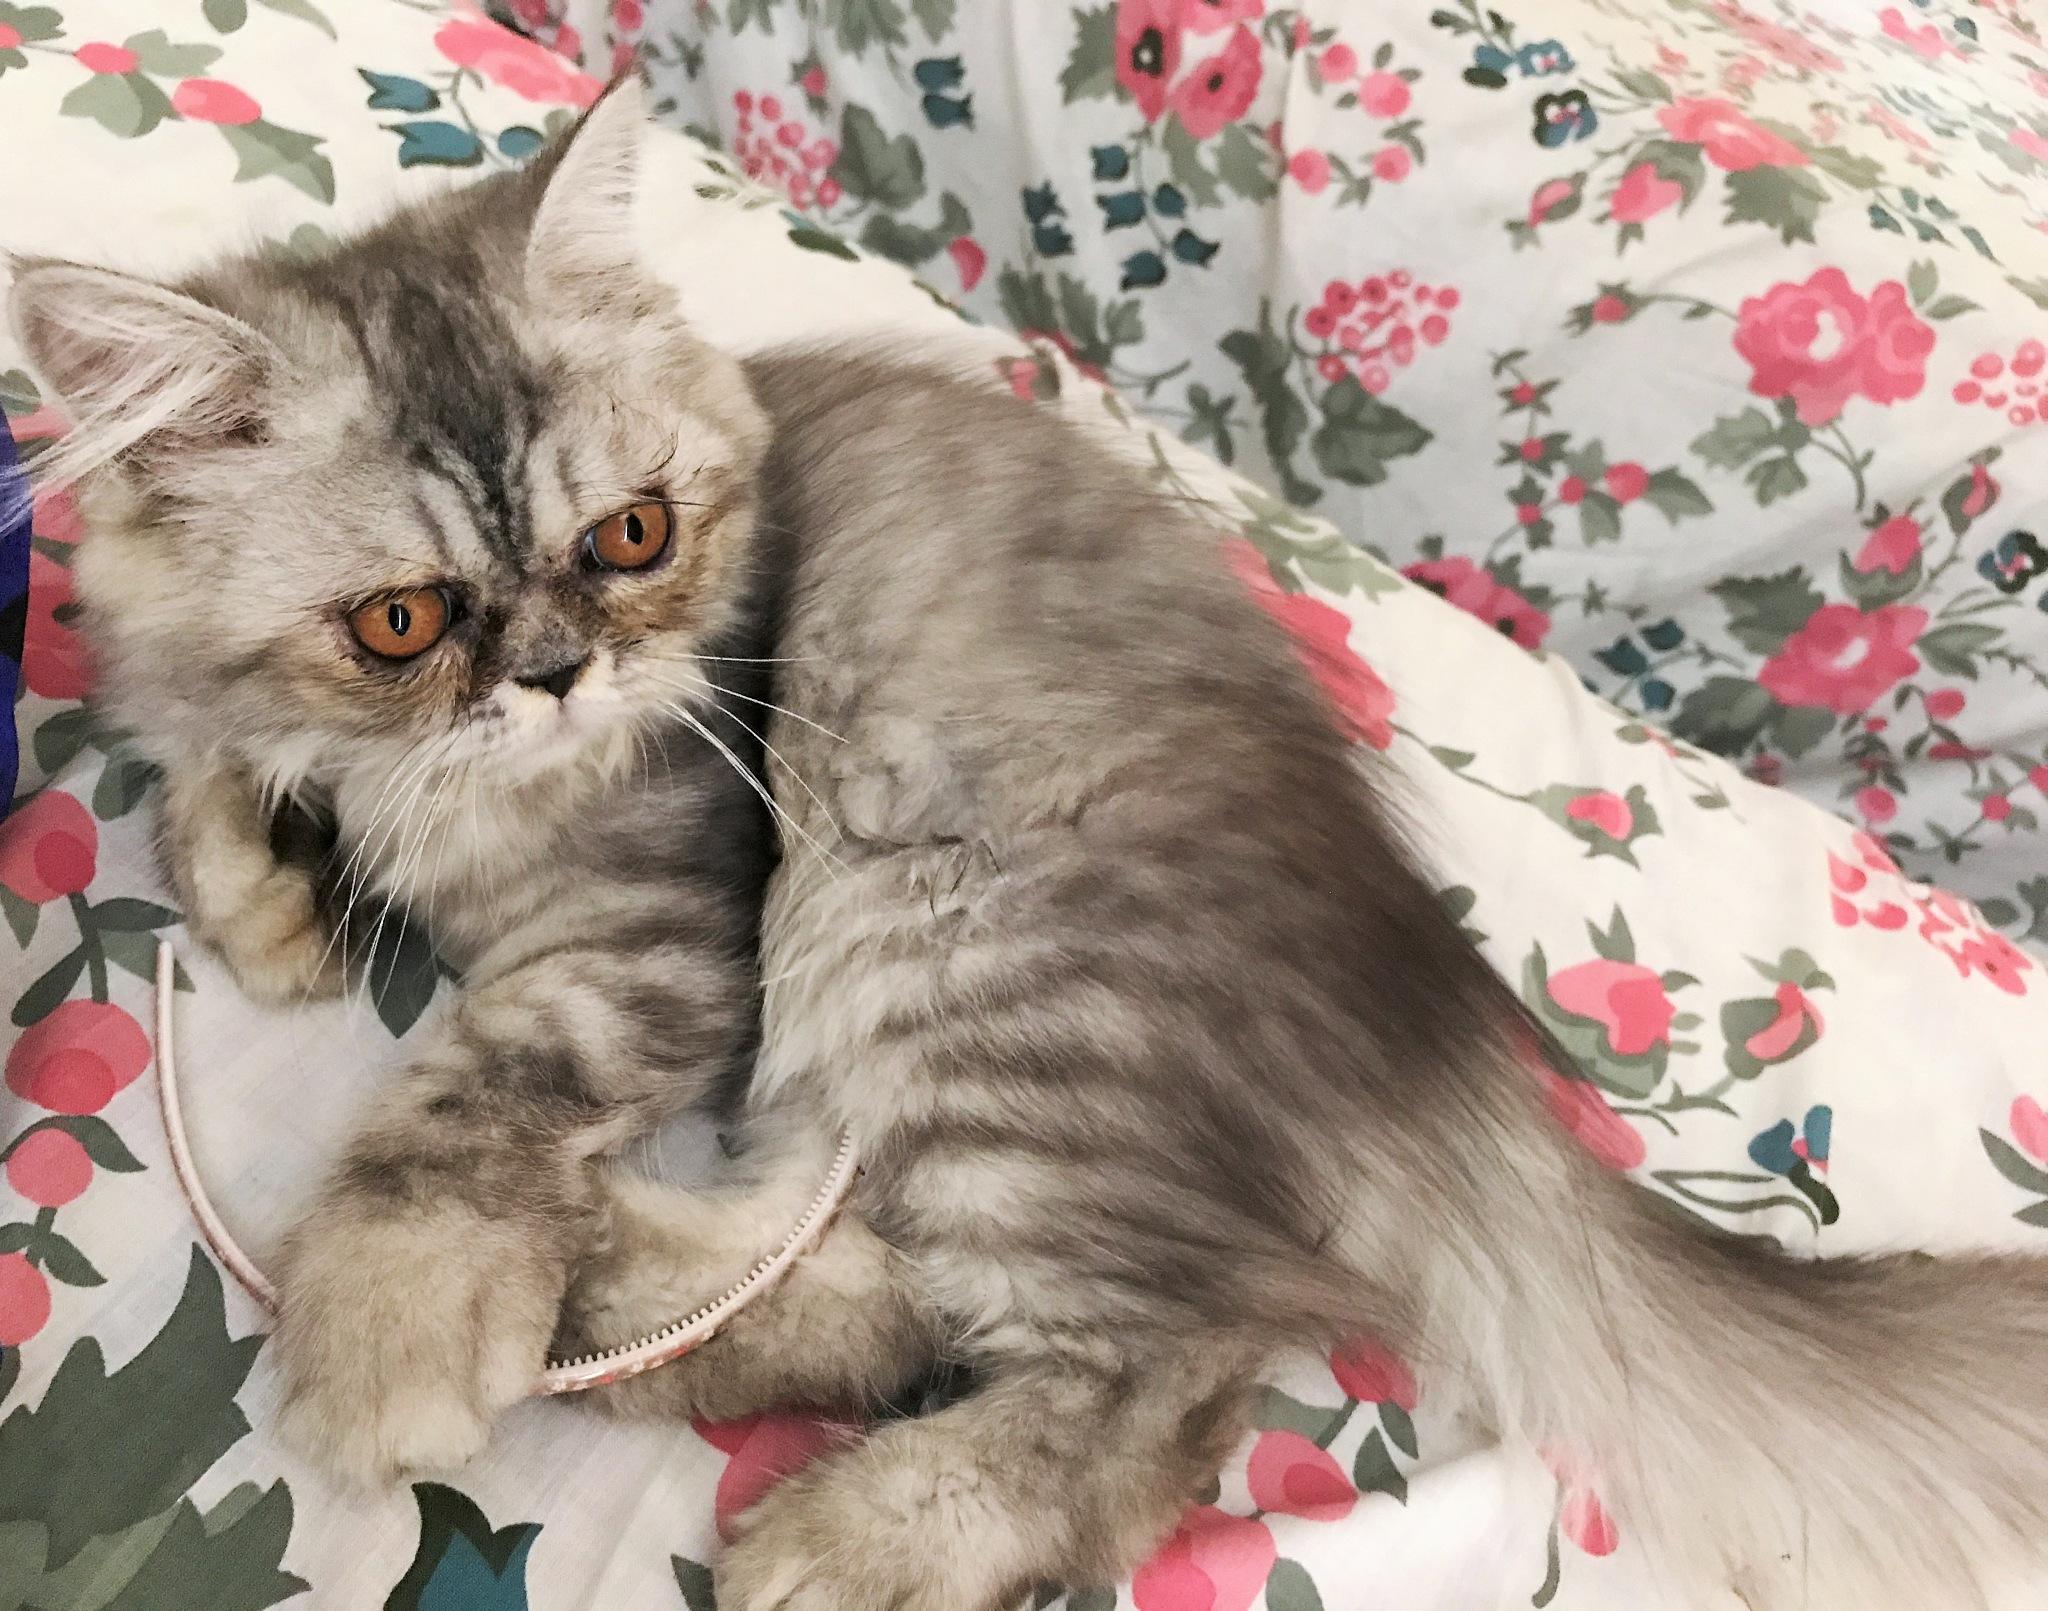 The Gollum Kitten by Liya Fahu